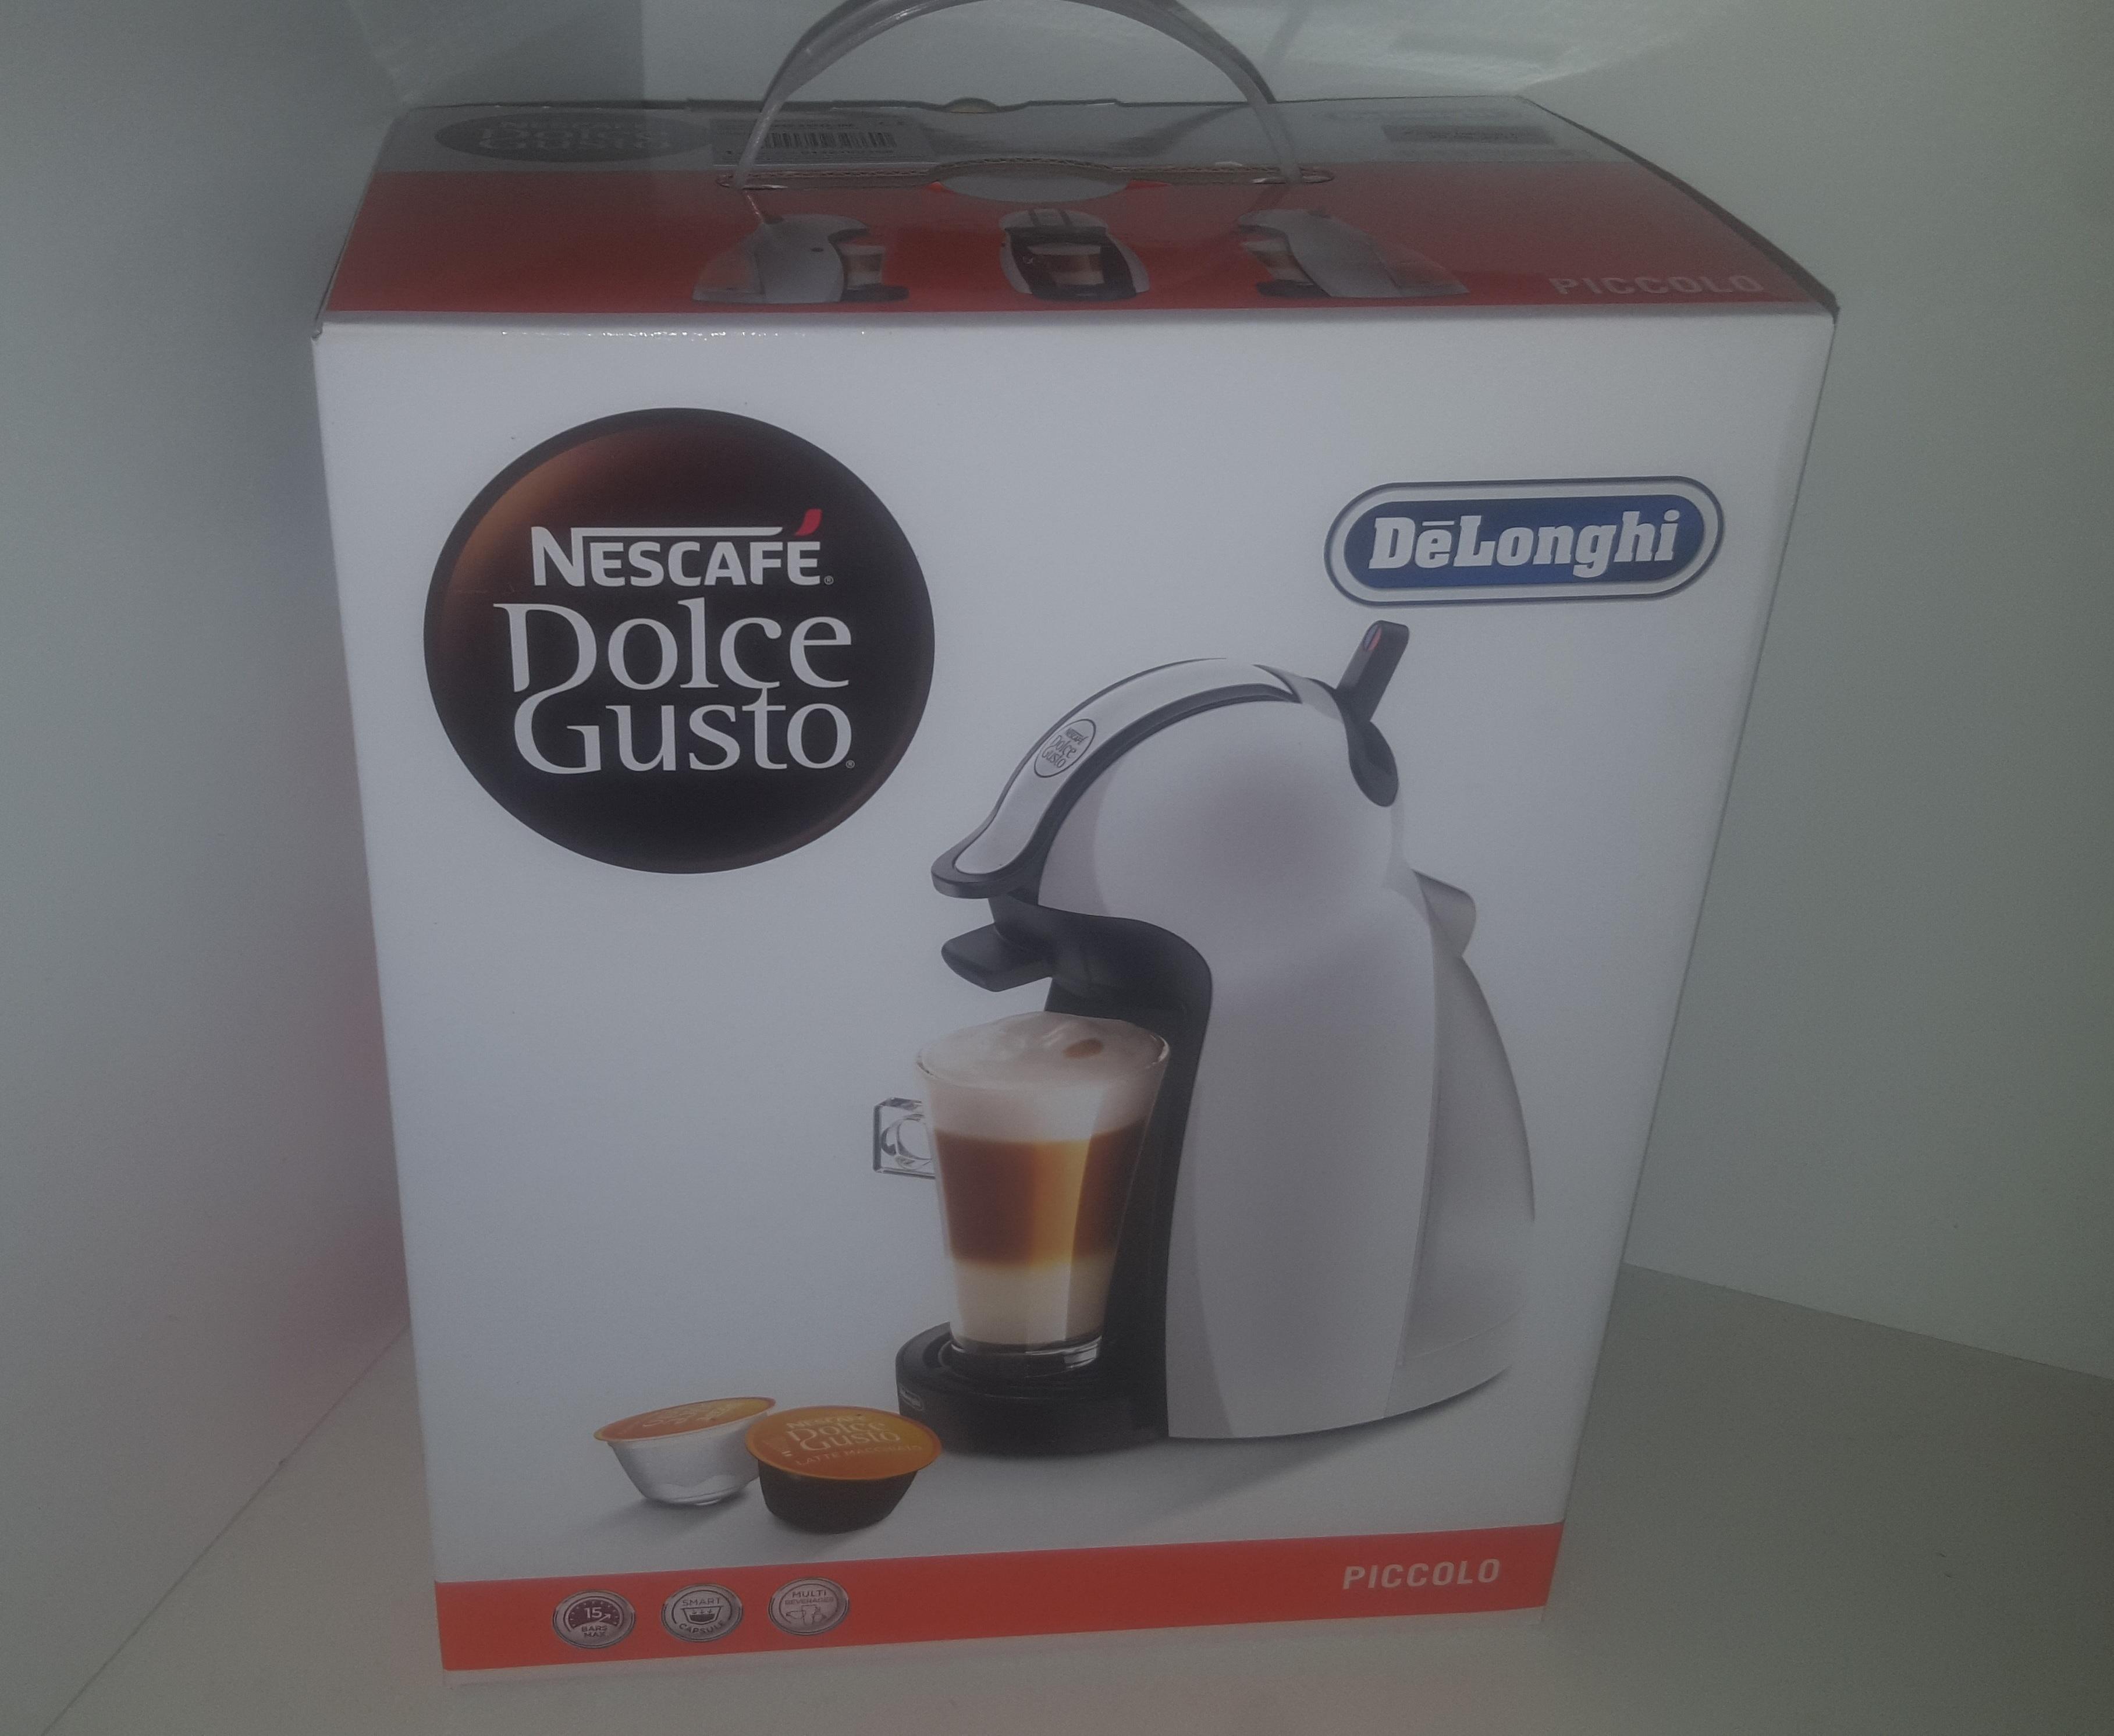 delonghi edg 100 w nescaf dolce gusto piccolo kaffeekapselmaschine wei ebay. Black Bedroom Furniture Sets. Home Design Ideas